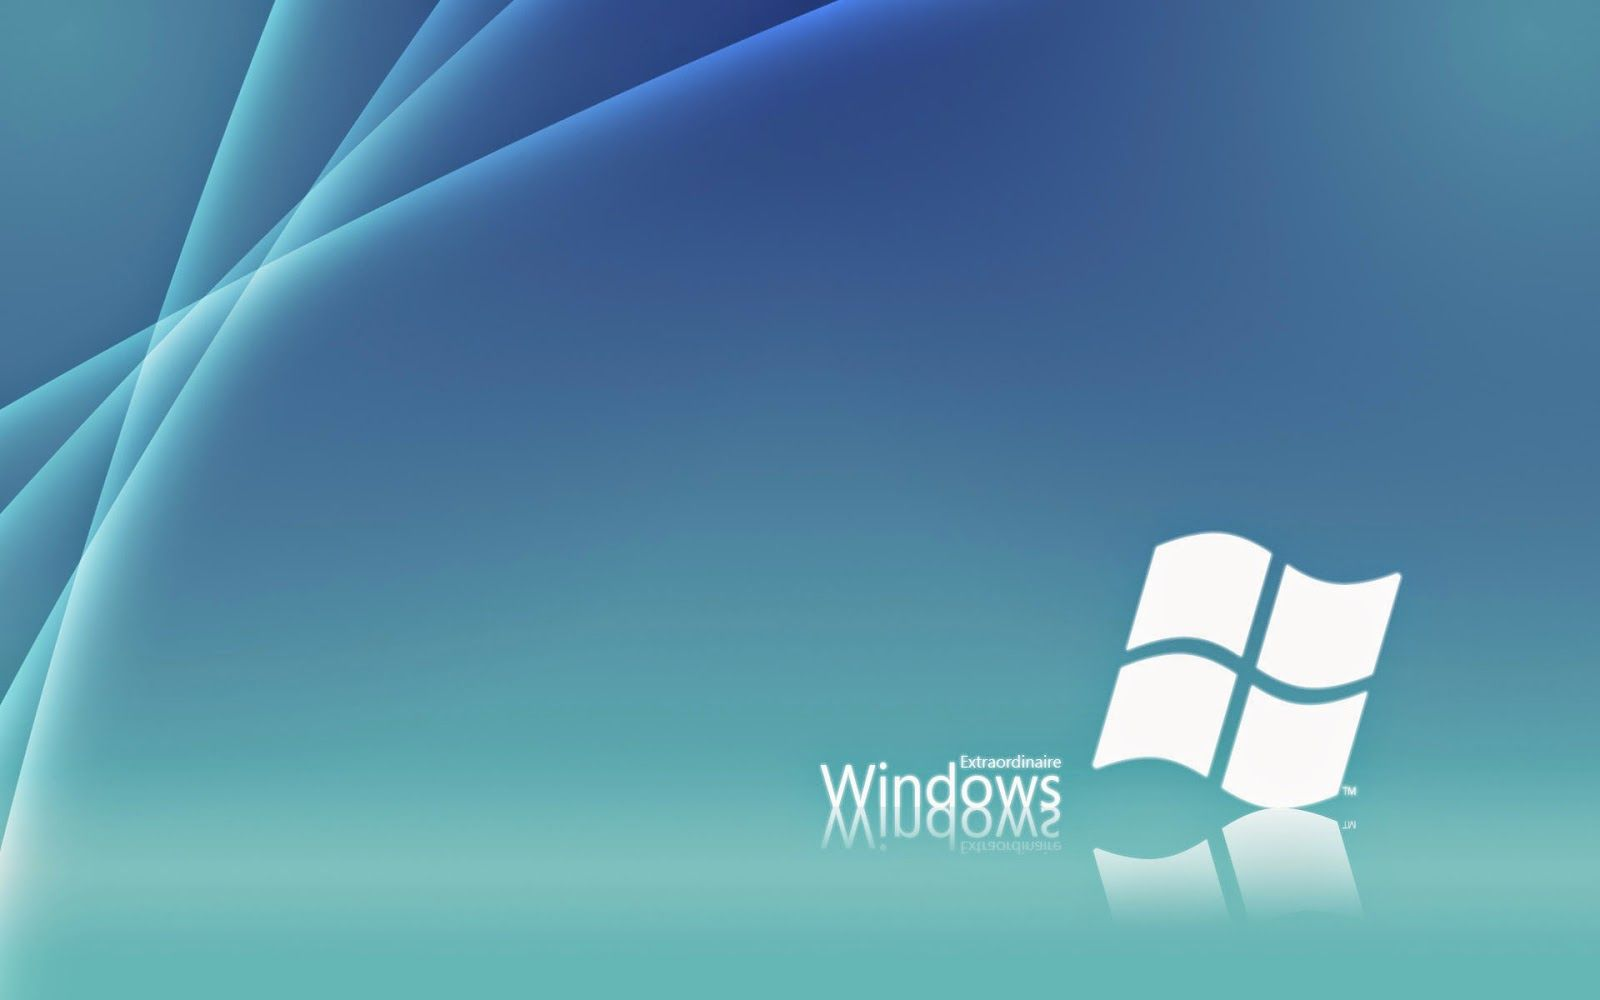 Windows 7 Professional Wallpapers Hd Group   Data-src - High Resolution Professional Desktop Background - HD Wallpaper